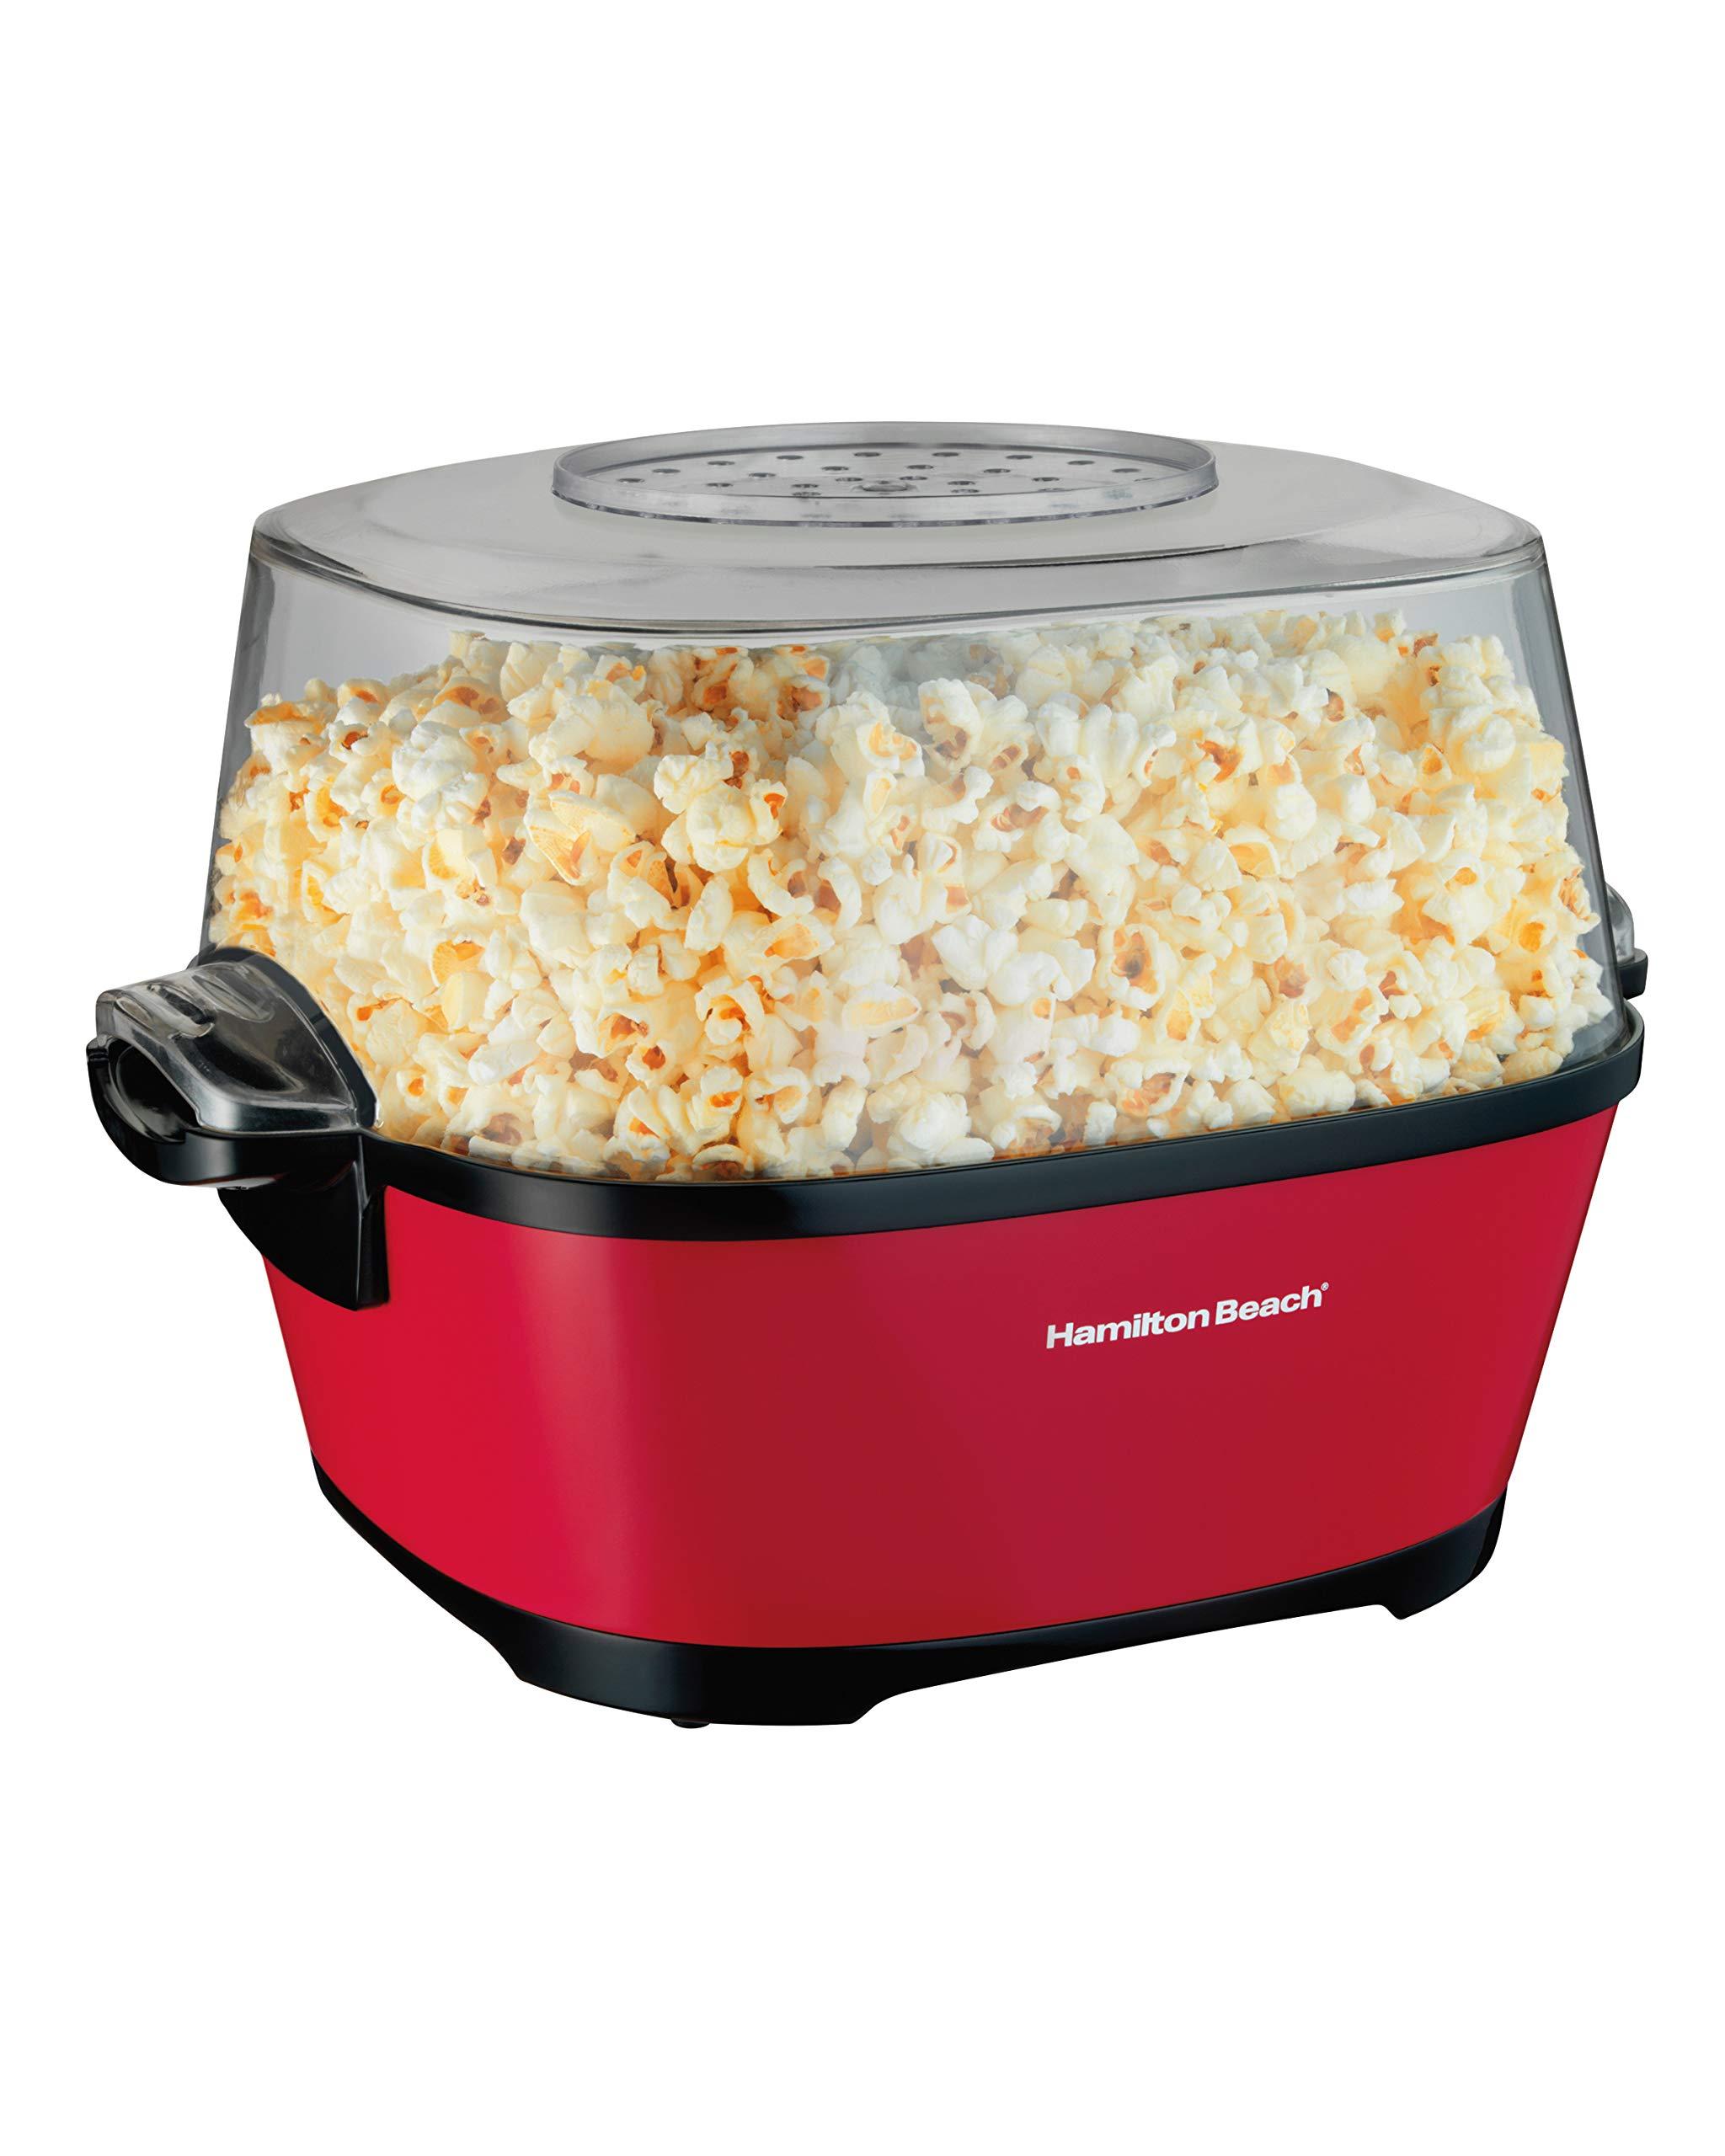 Hamilton Beach 73302 palomitas de maiz poppers - Palomitero (350 x 280 x 240 mm) Negro, Rojo, Transparente: Amazon.es: Hogar